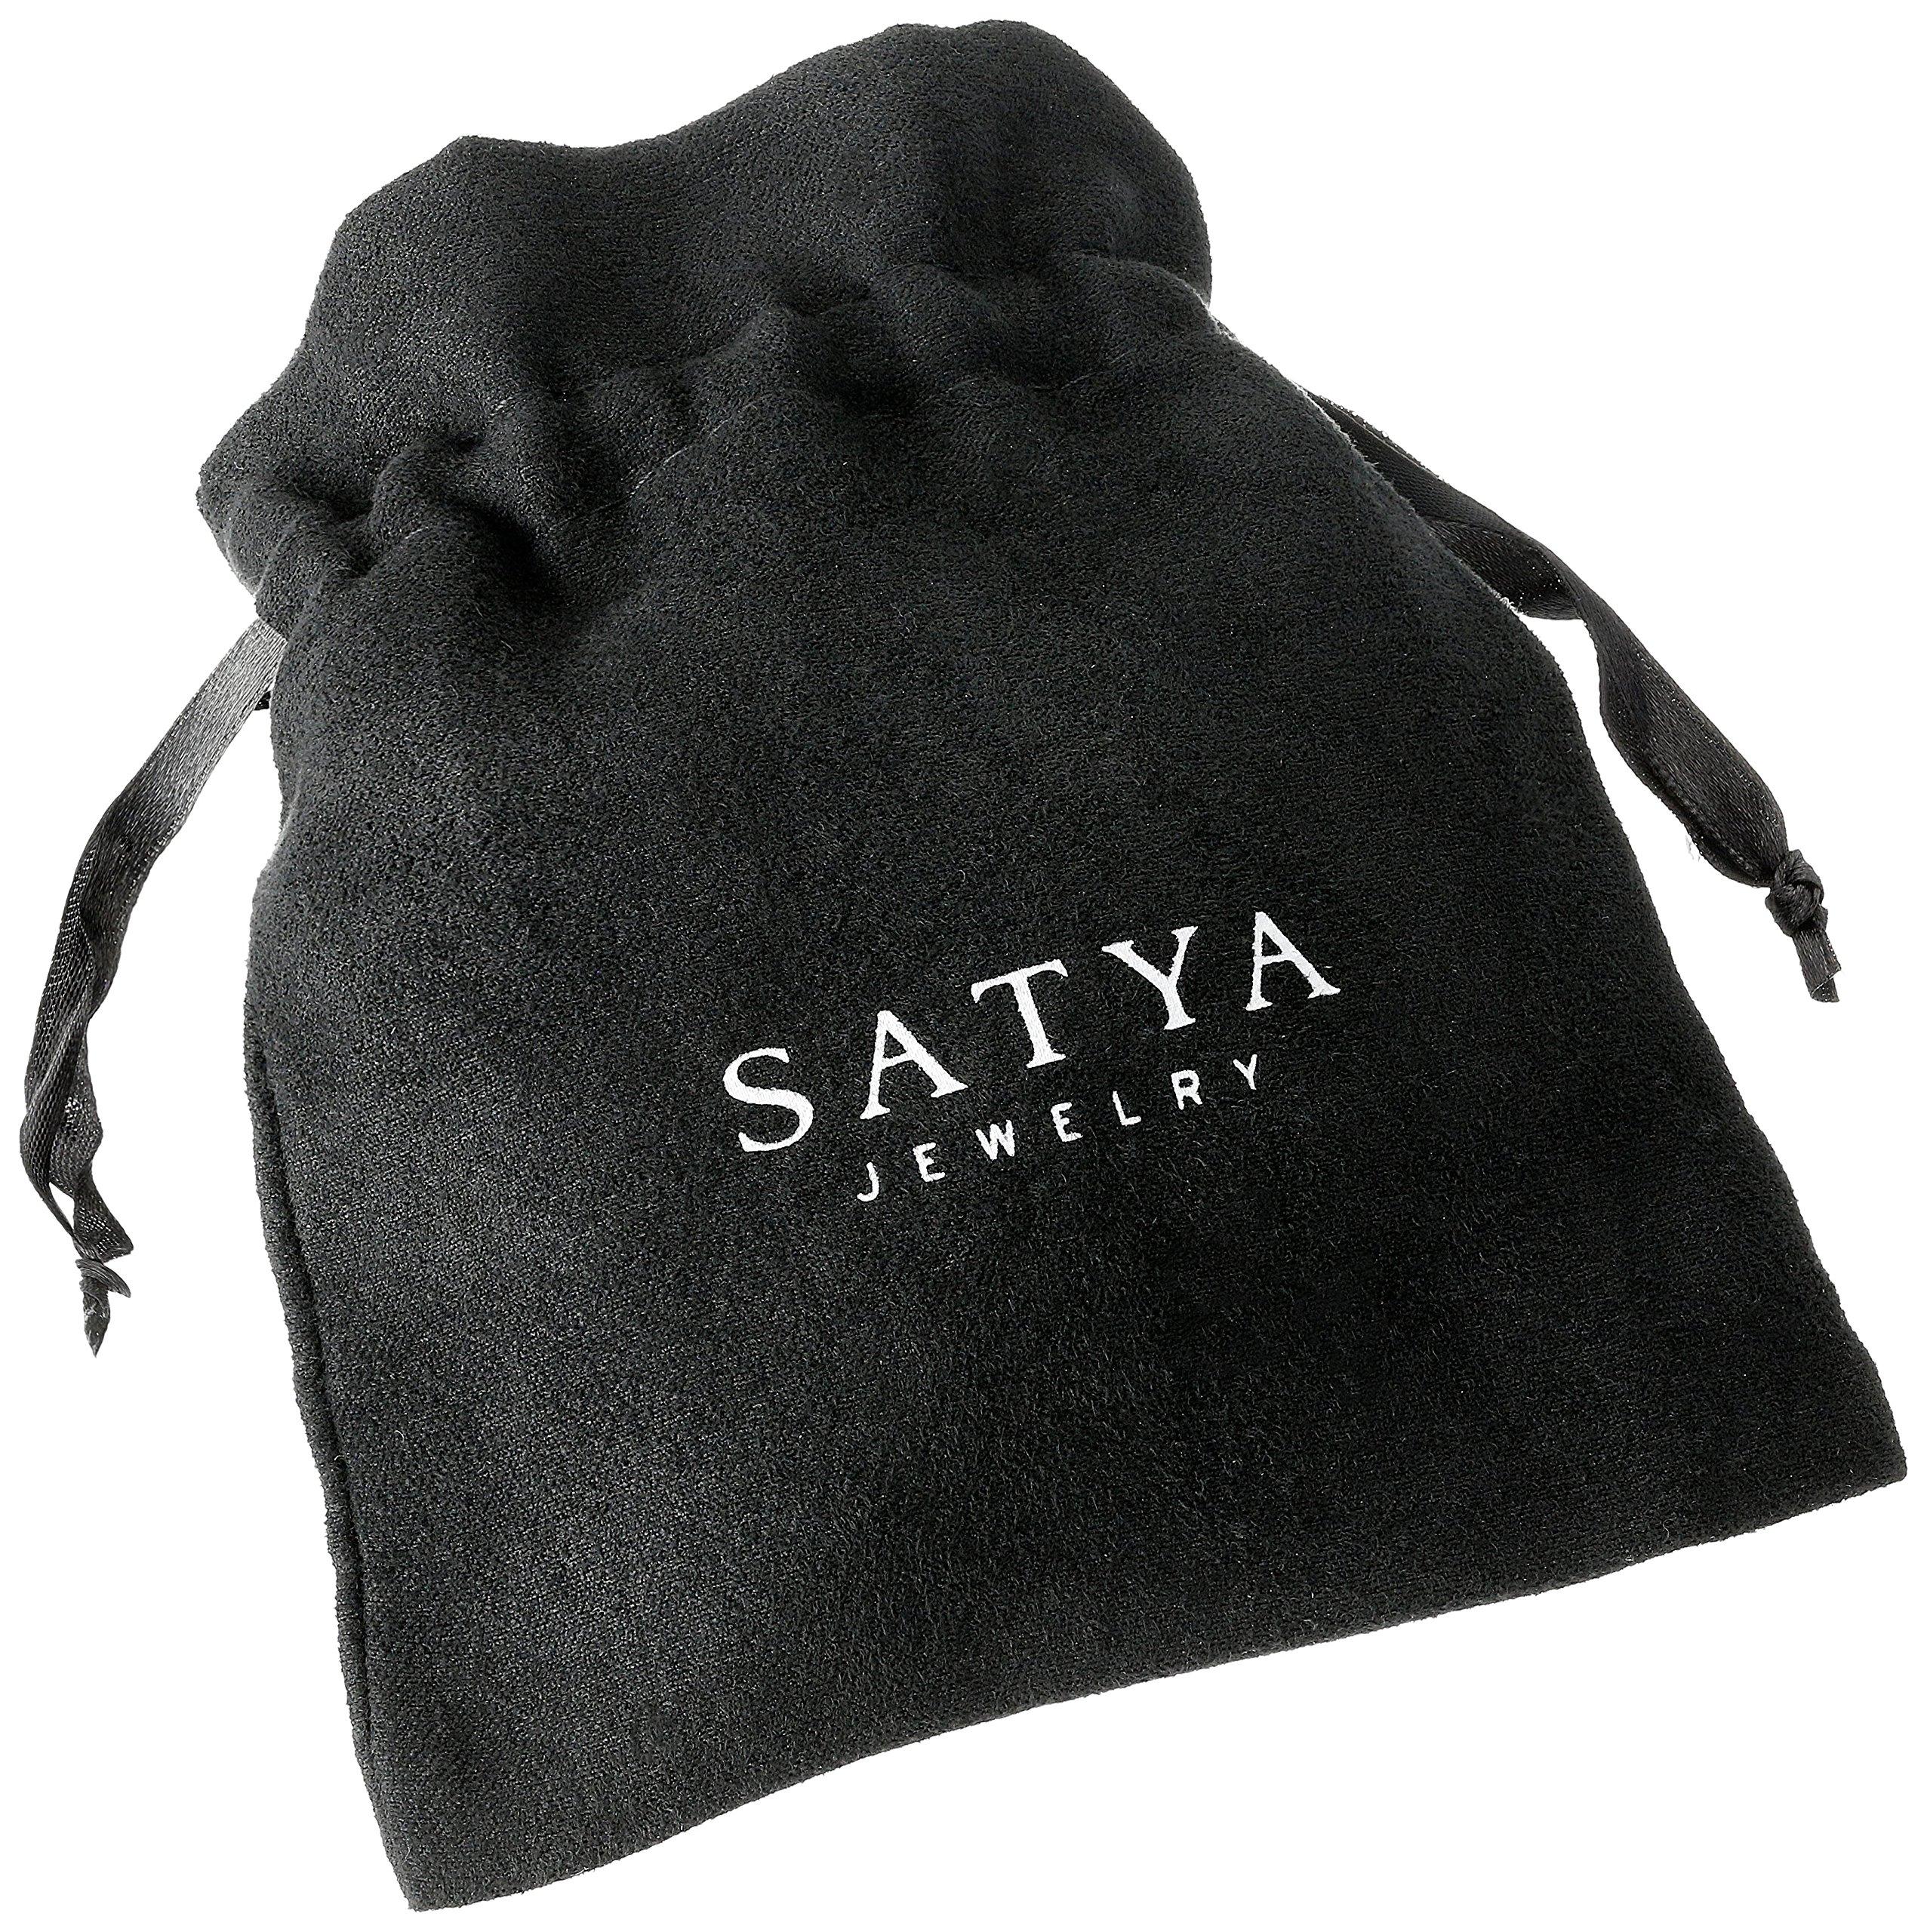 Satya Jewelry Freshwater Pearl Om Mandala Bracelet Set by Satya Jewelry (Image #3)